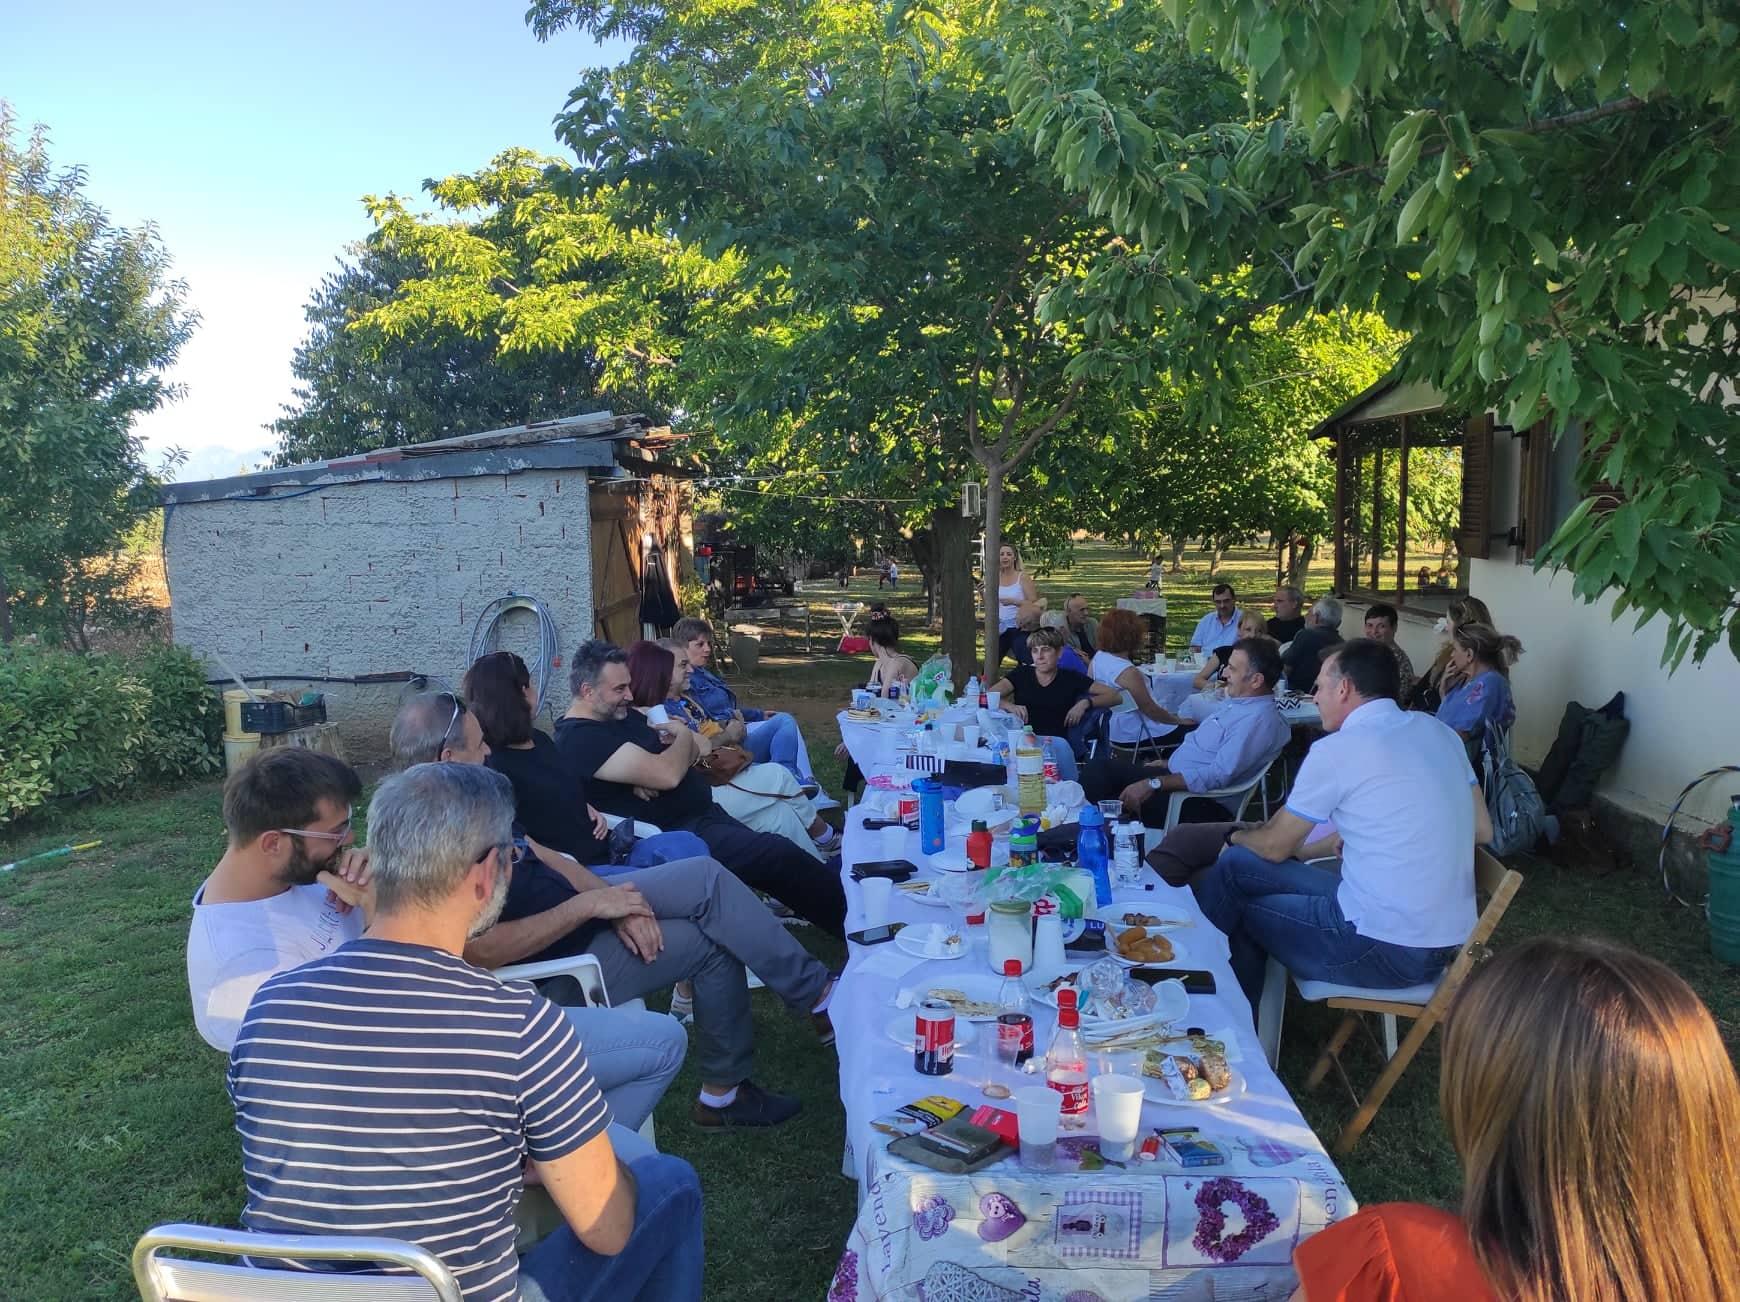 kozan.gr: Μπάρμπεκιου γεύμα, για φίλους και γνωστούς της Δημοτικής Κίνησης Κοζάνη – Τόπος να Ζεις, στο κτήμα του δημοτικού συμβούλου Κοζάνης Μ. Κουτσοσίμου, το μεσημέρι του Σαββάτου 25/9 (Φωτογραφίες)